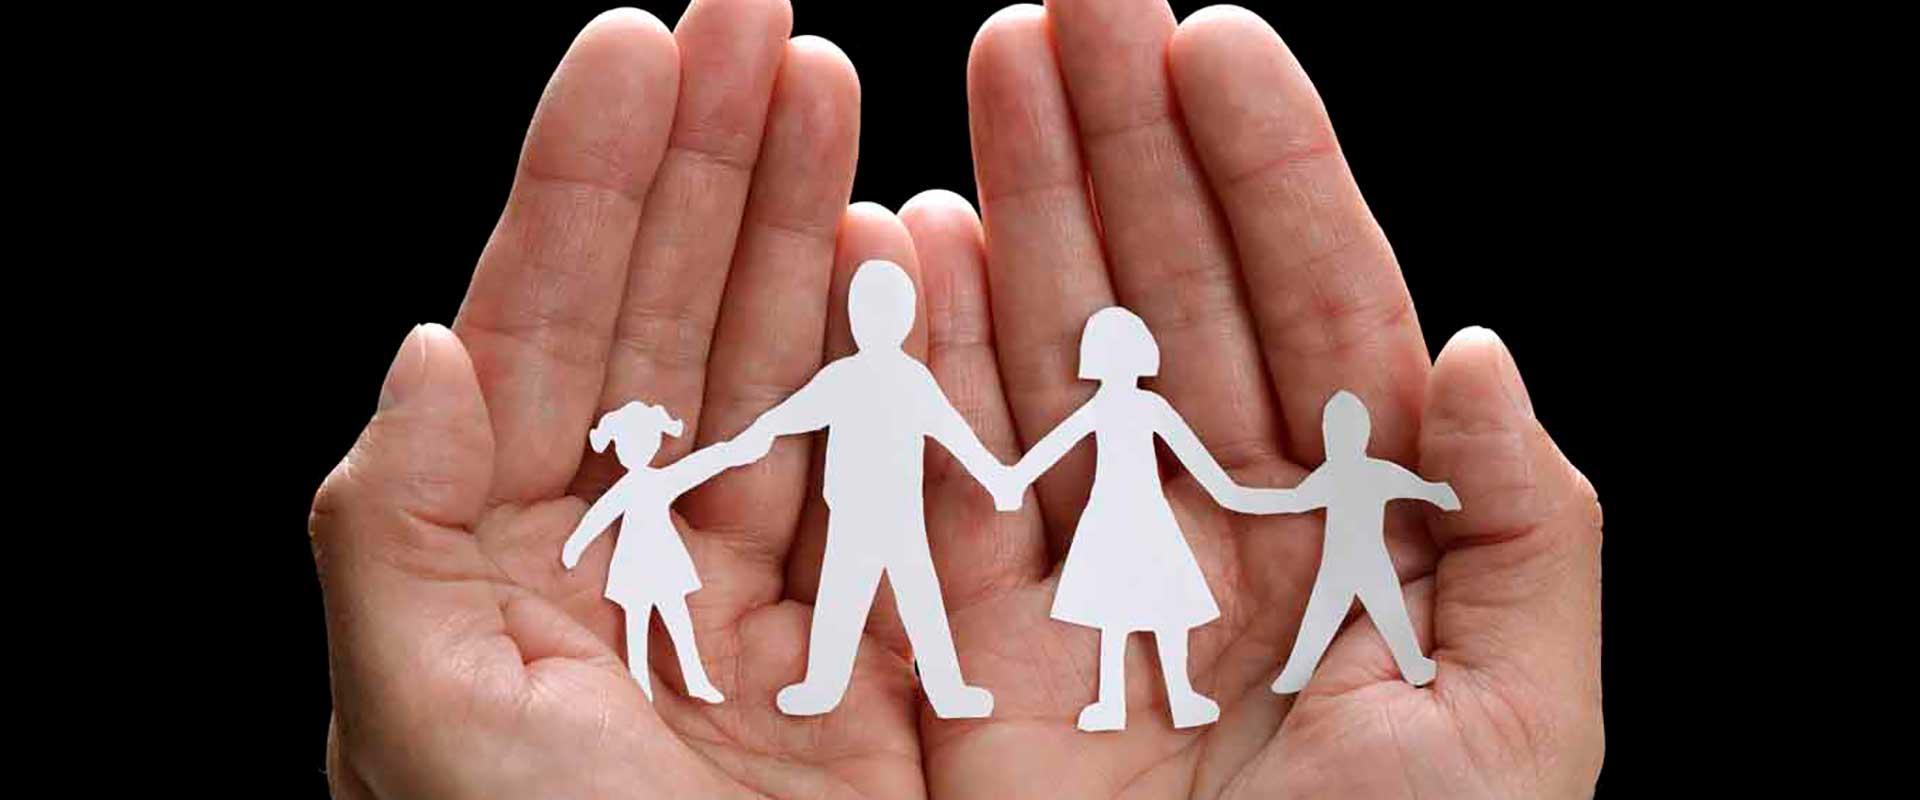 2_family1920x800